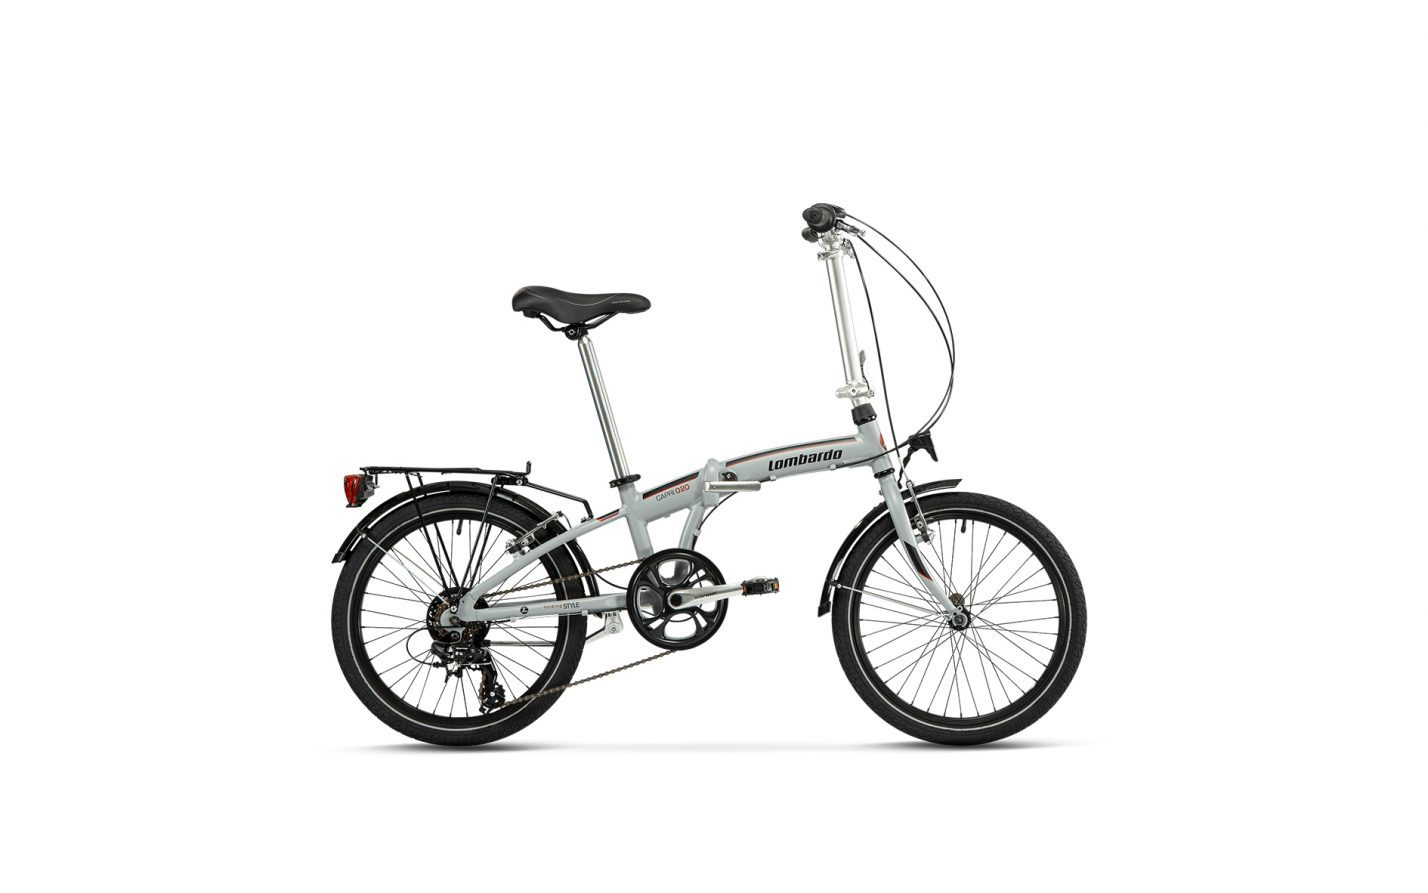 FOLDER BIKE - Noleggio city bike pieghevole Pisa